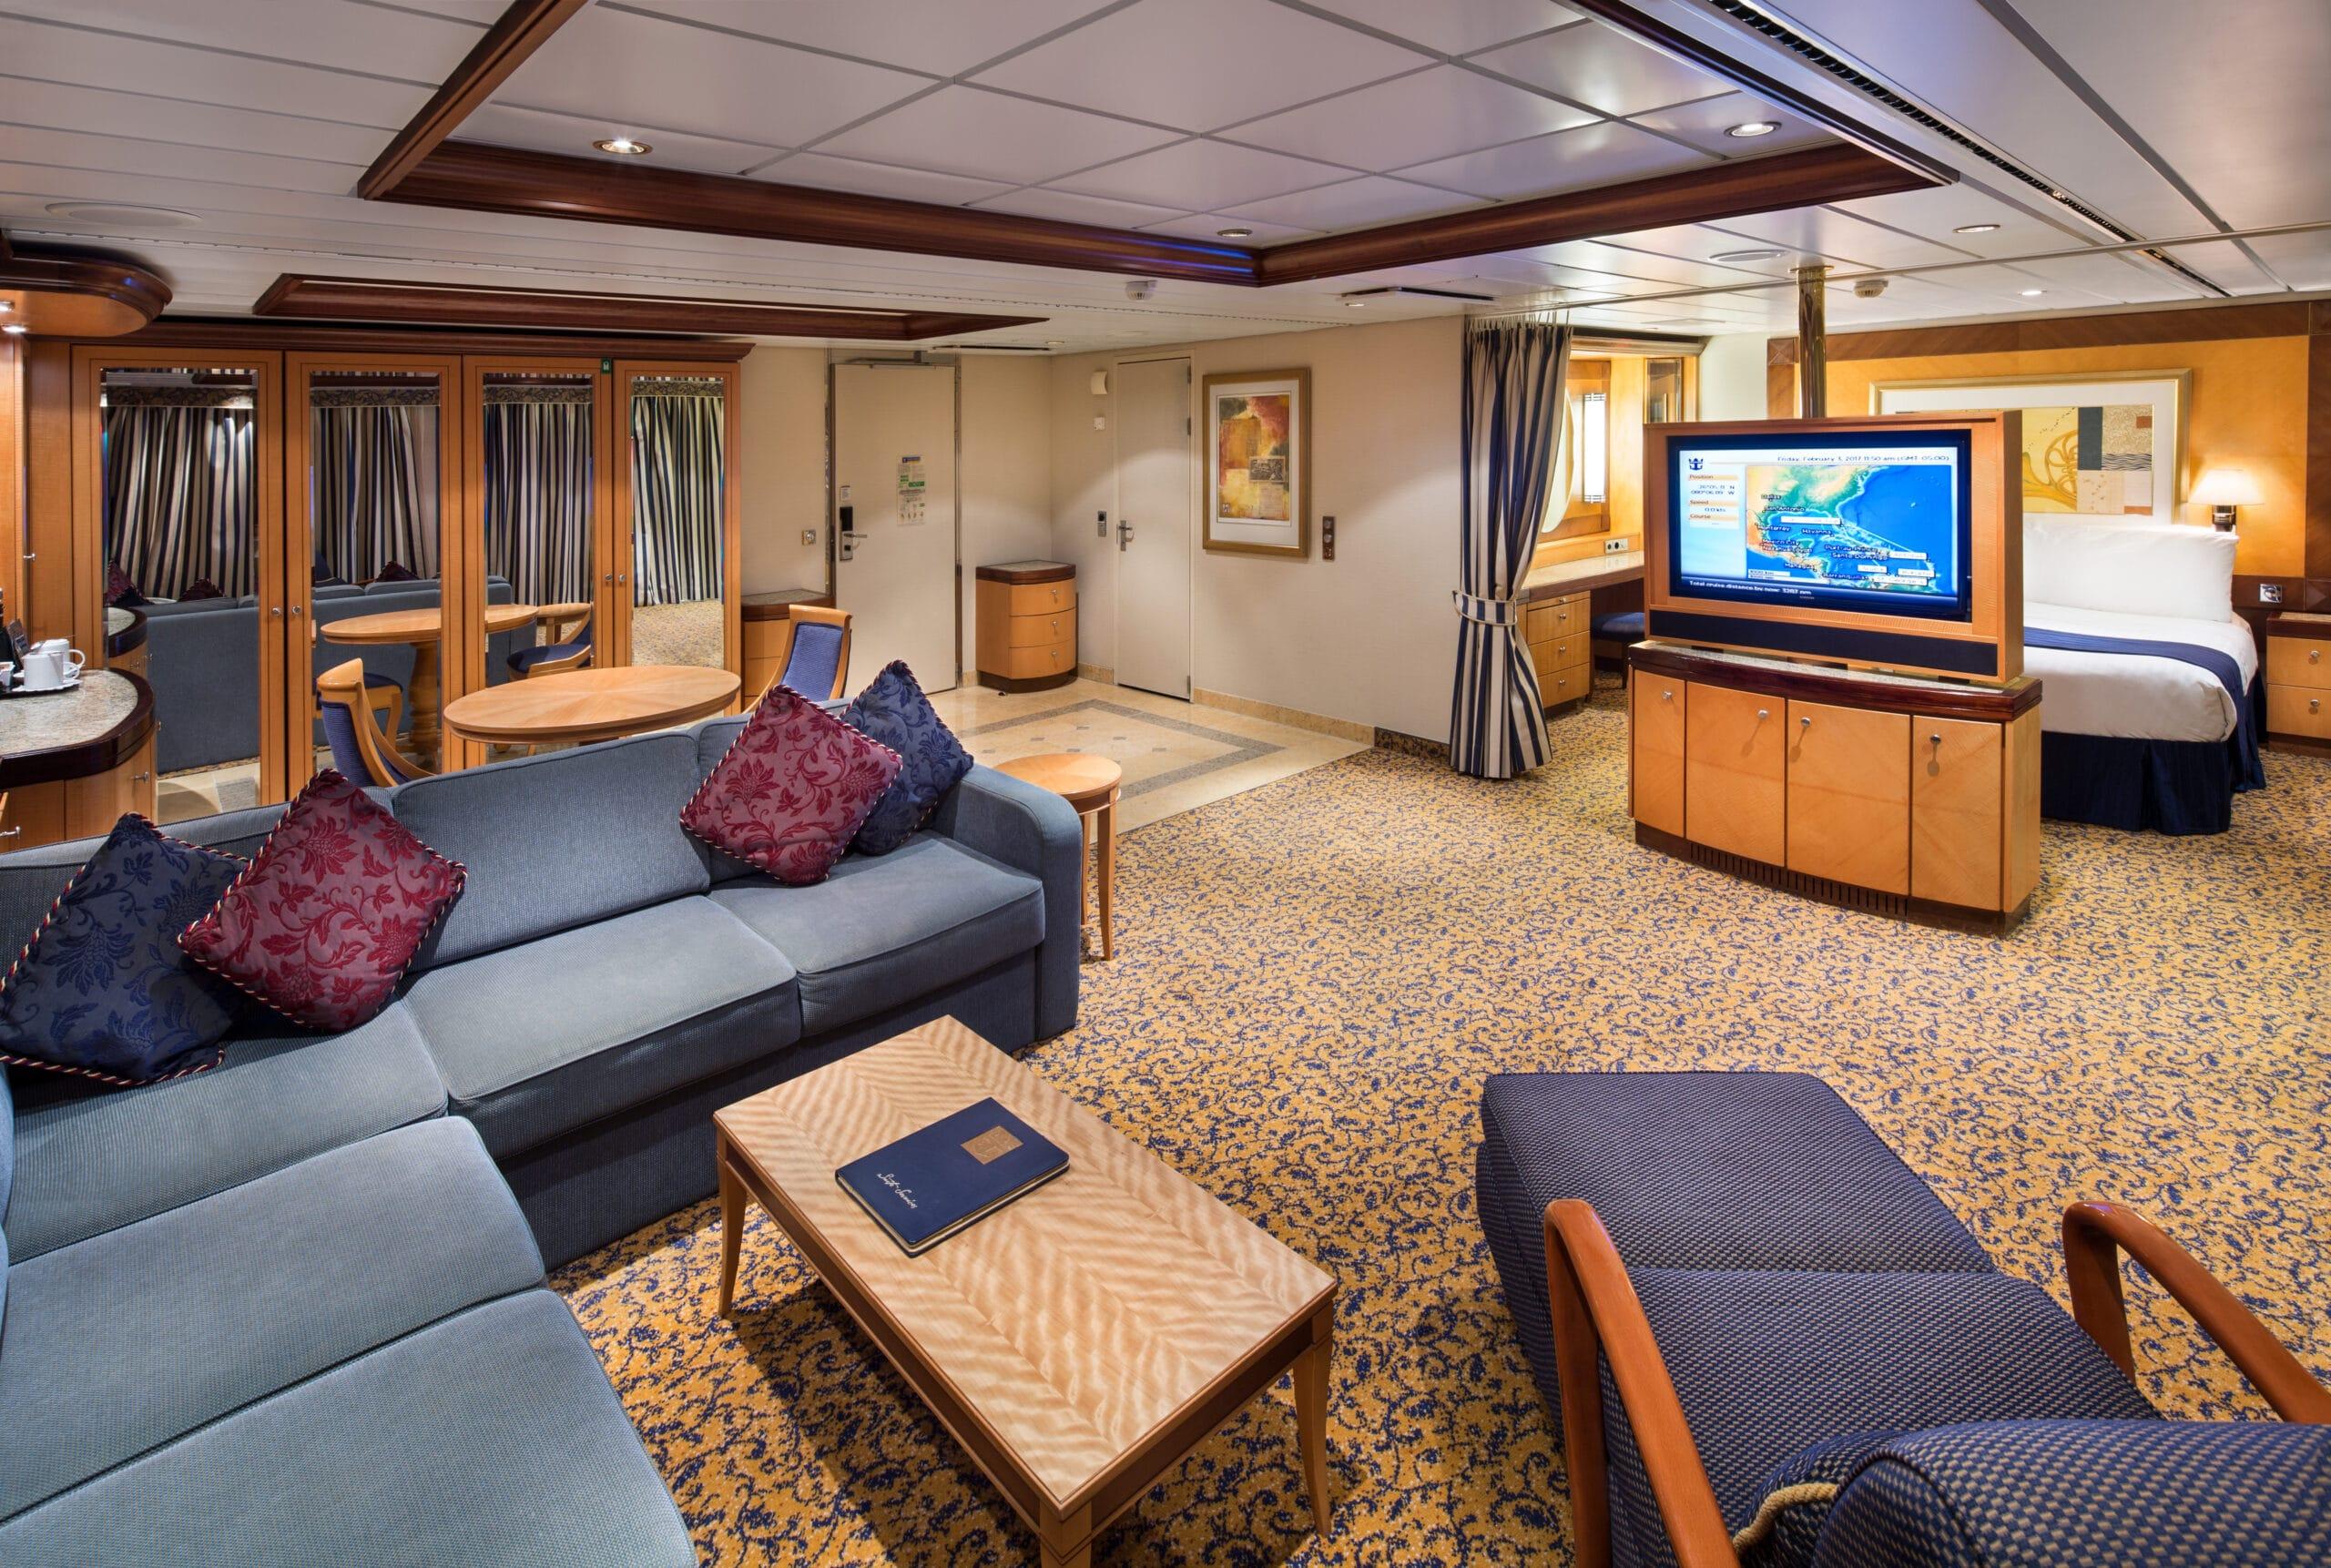 Royal-Caribbean-International-Serenade-of-the-Seas-schip-cruiseschip-categorie-OT-Owner-Suite-2-bedroom